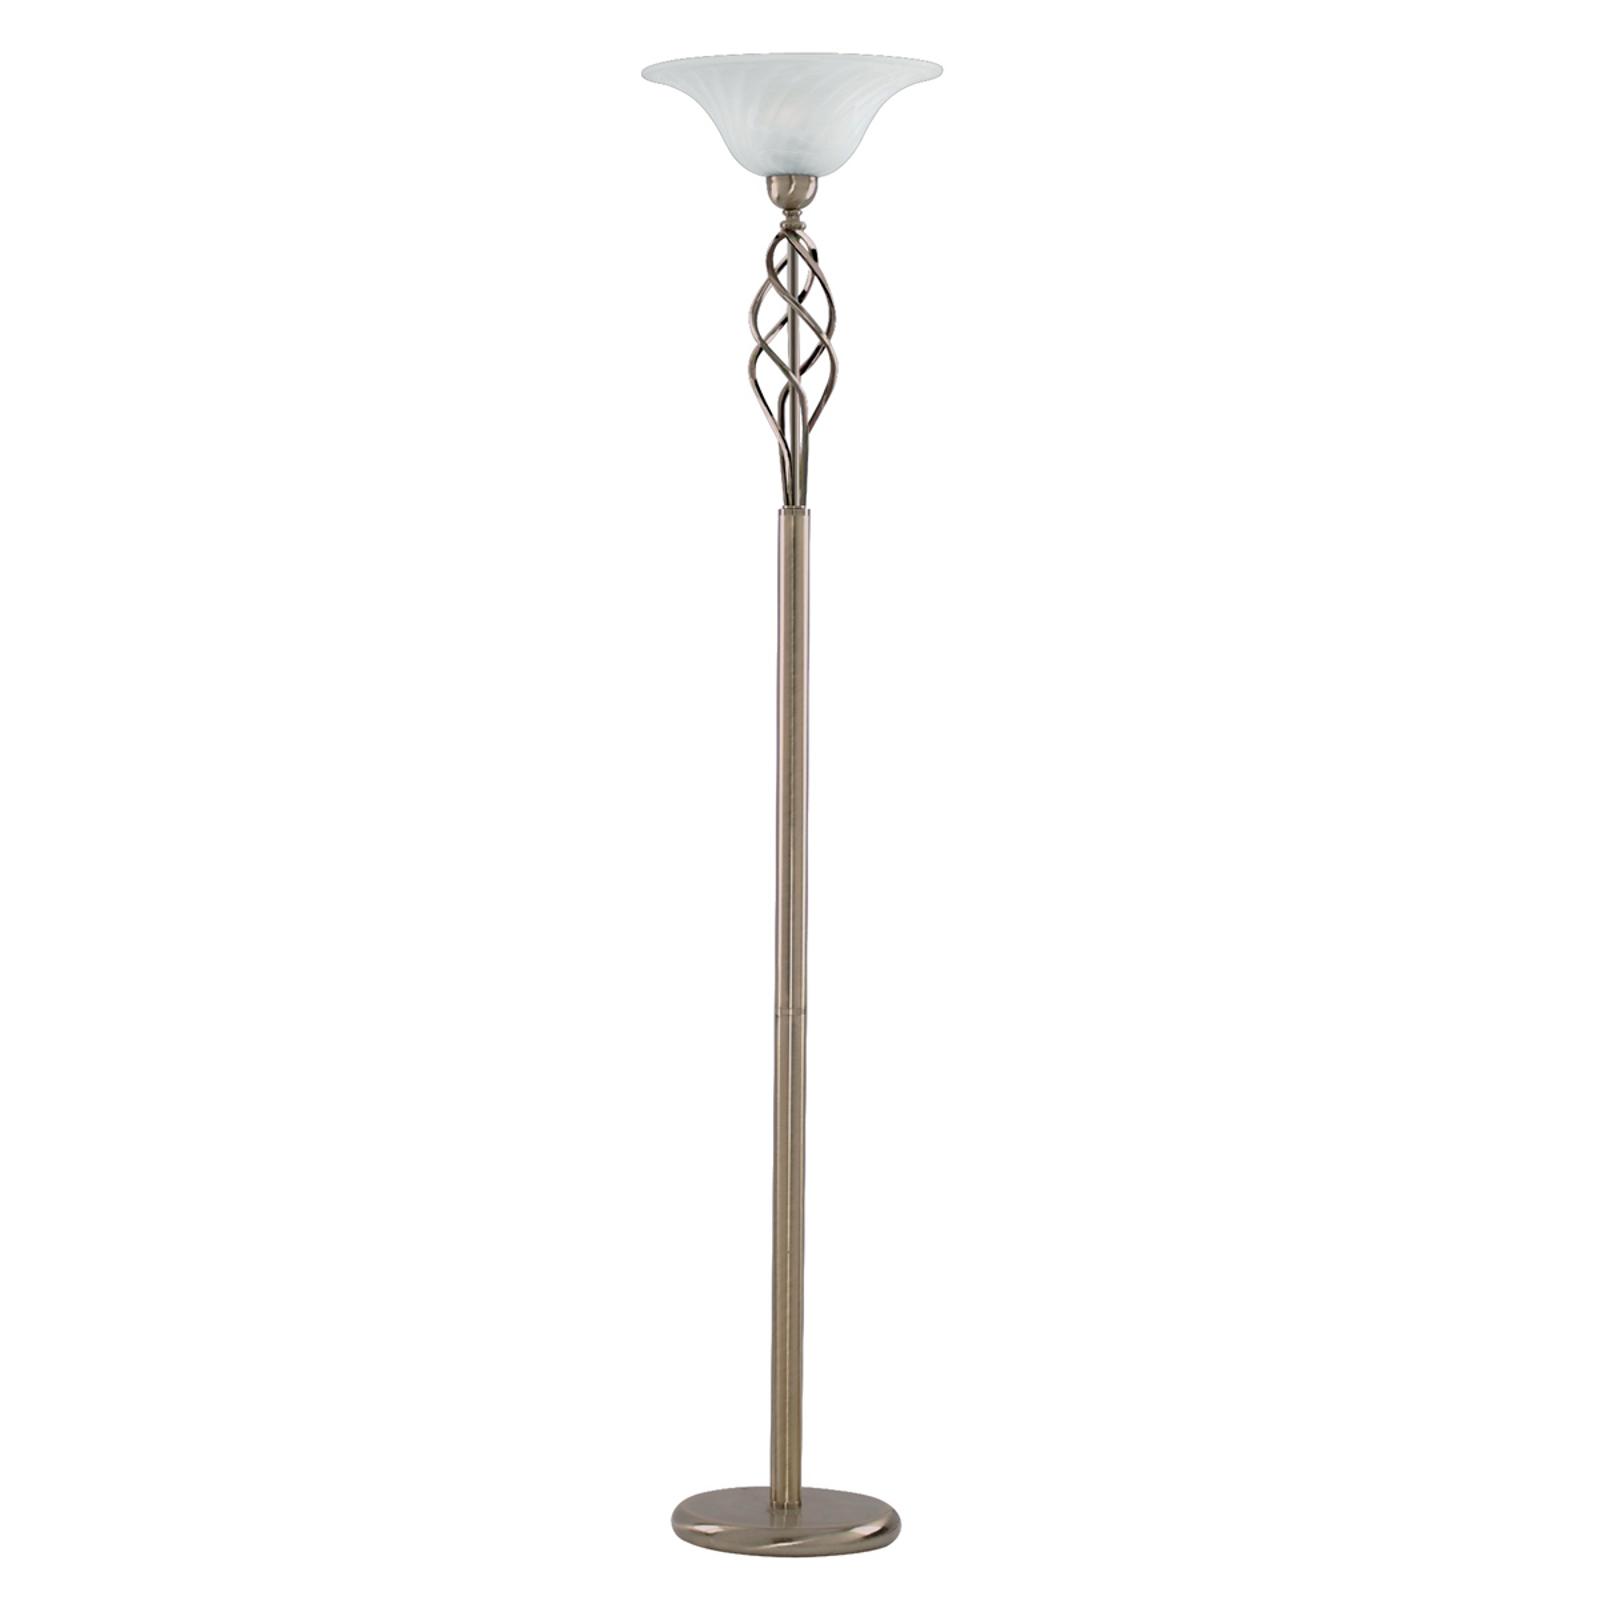 Elegante lampada pavimento FIONNA, ottone antico